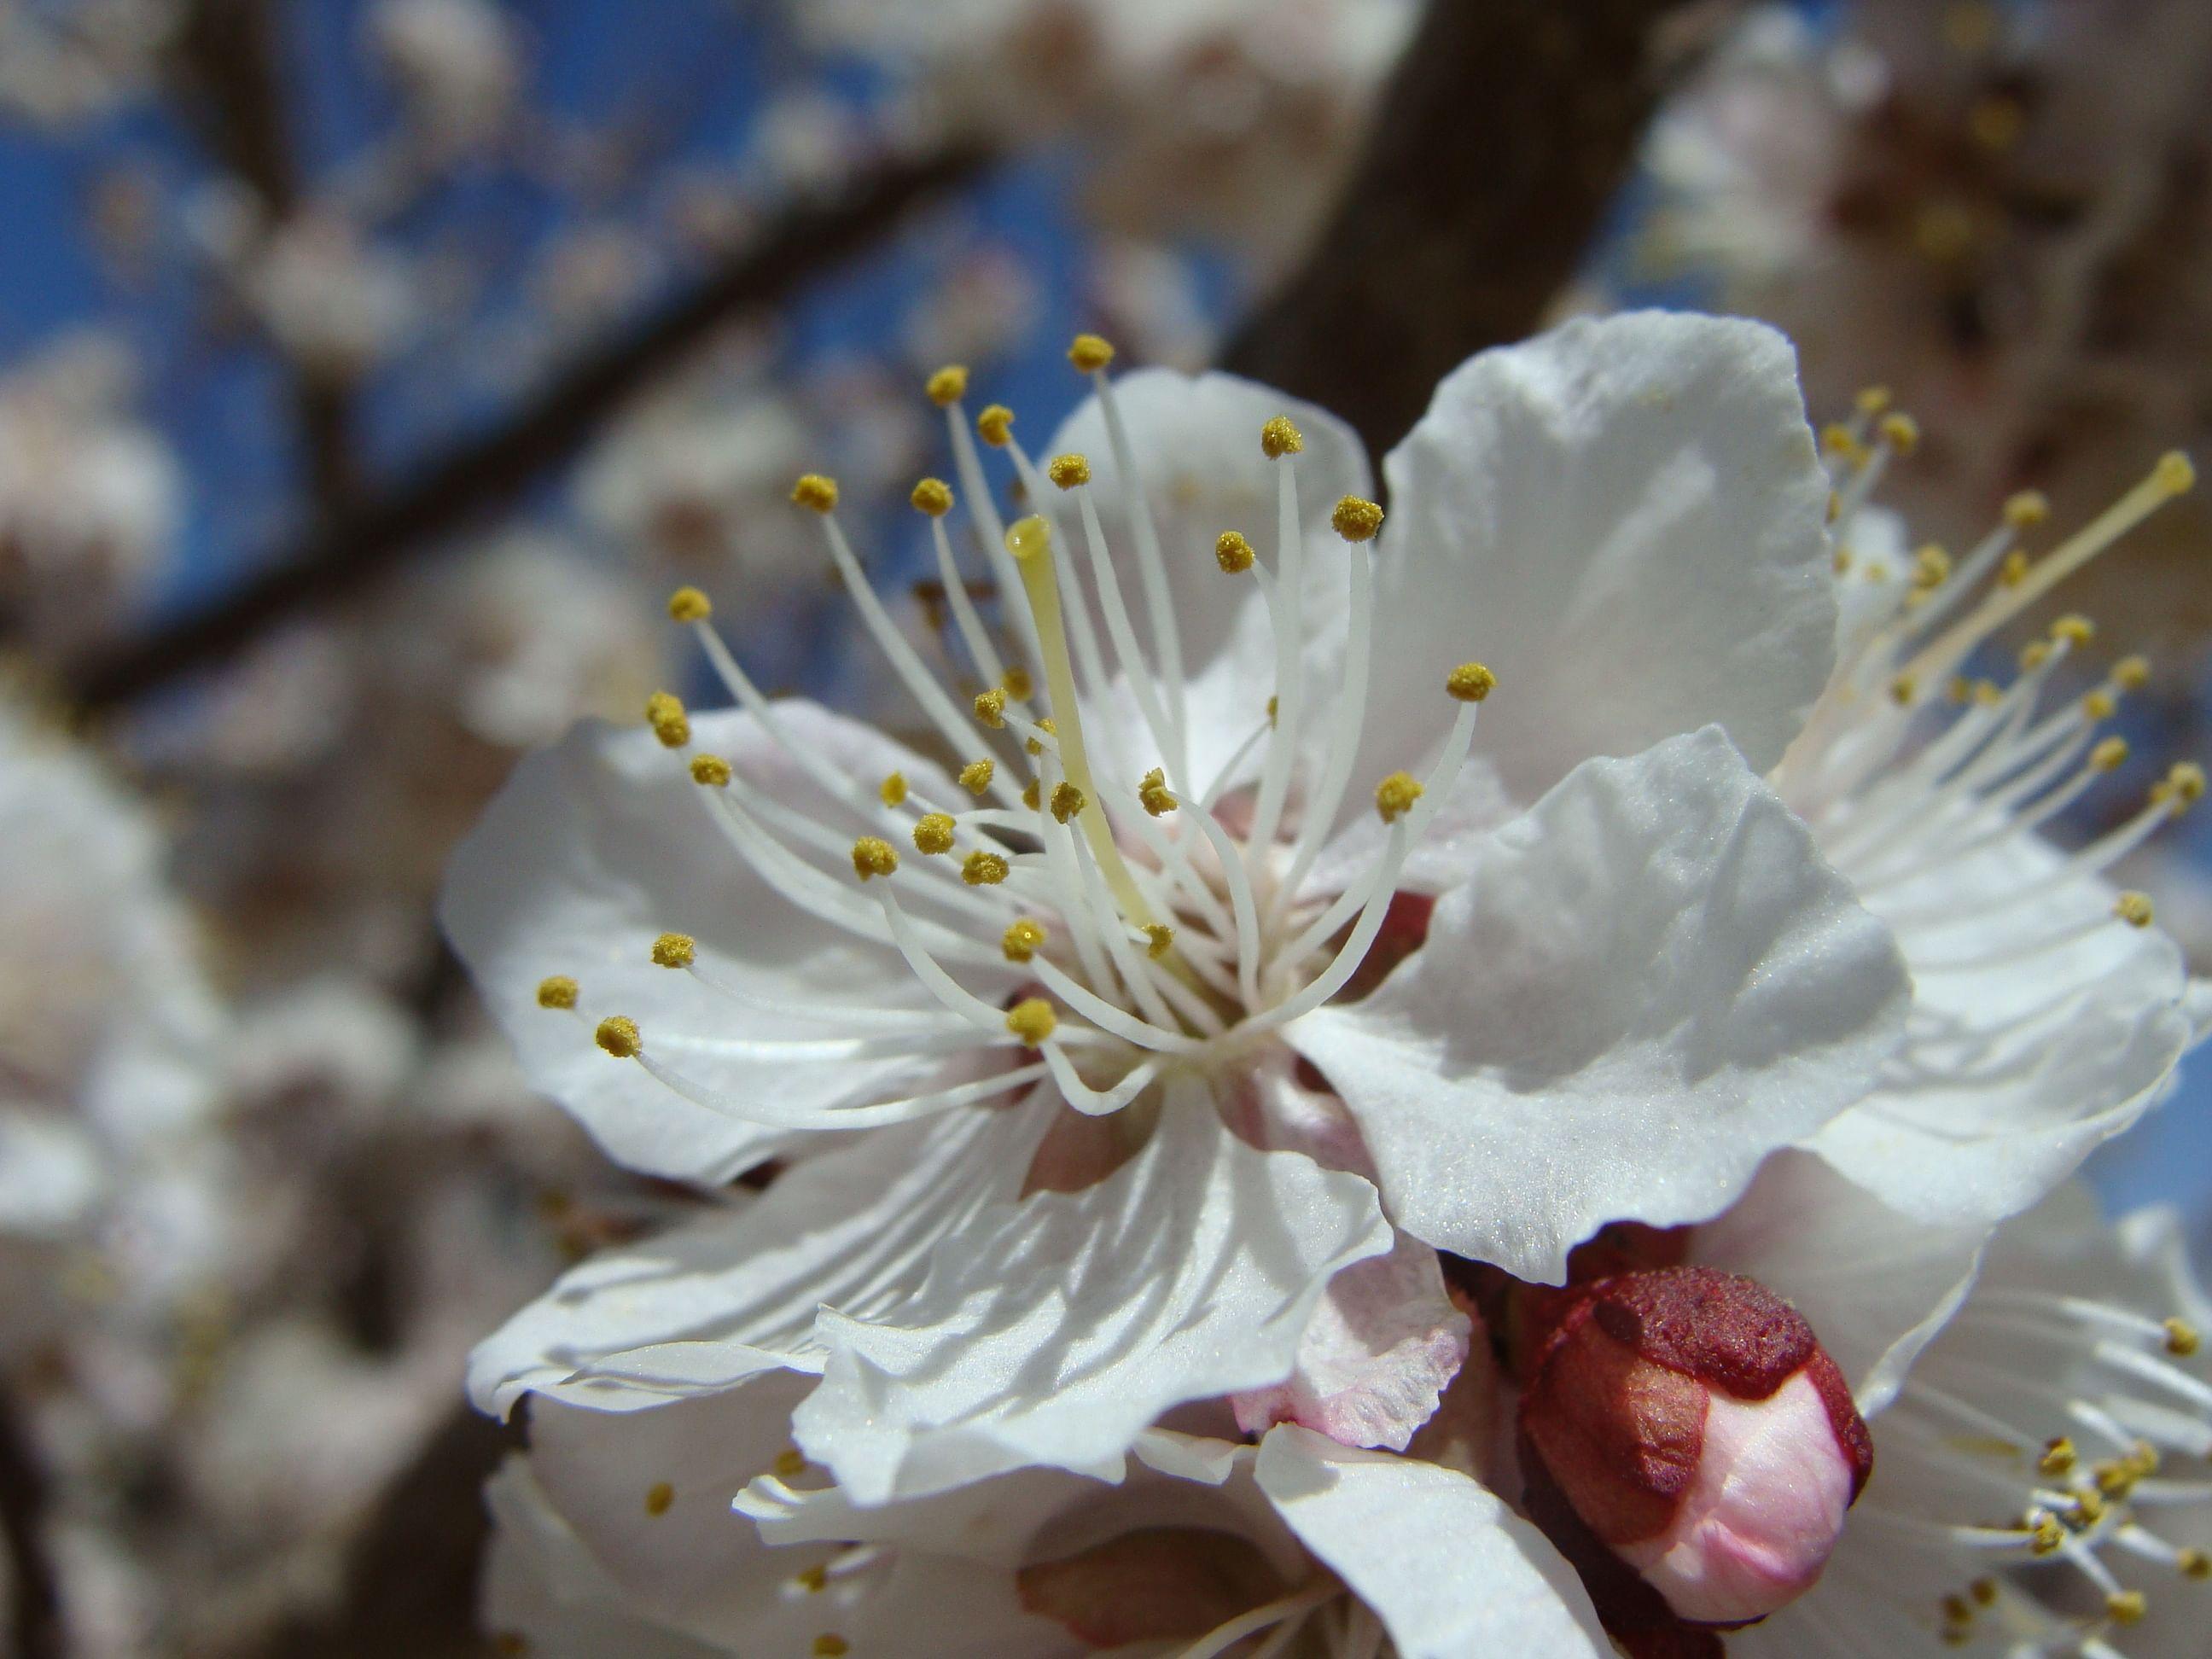 In Bloom (Source: Dr Tsering Stobdan)